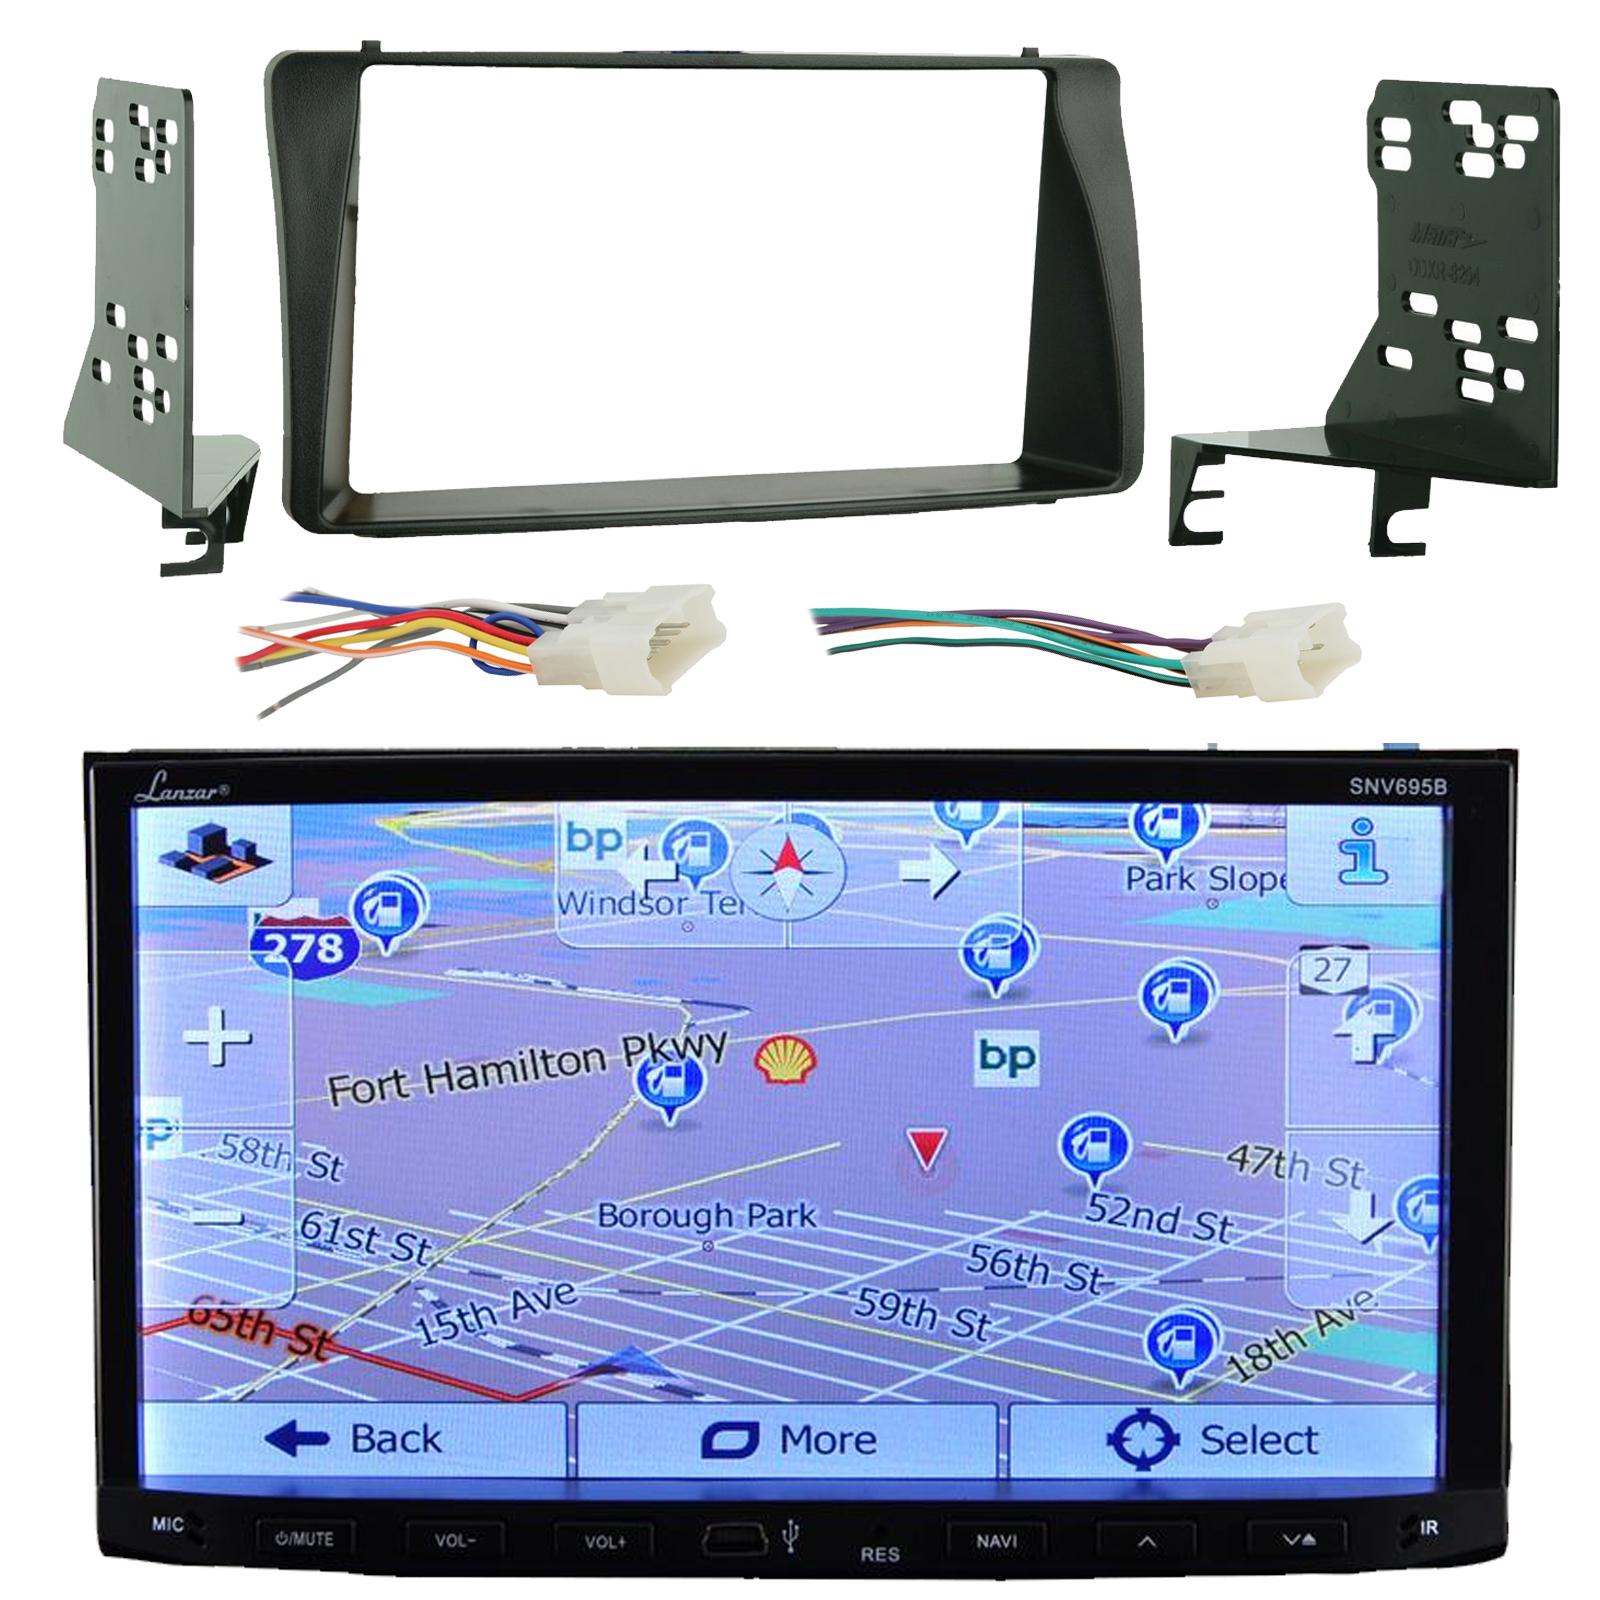 Lanzar SNV695B 7'' Touch Screen Bluetooth CD/DVD Player G...